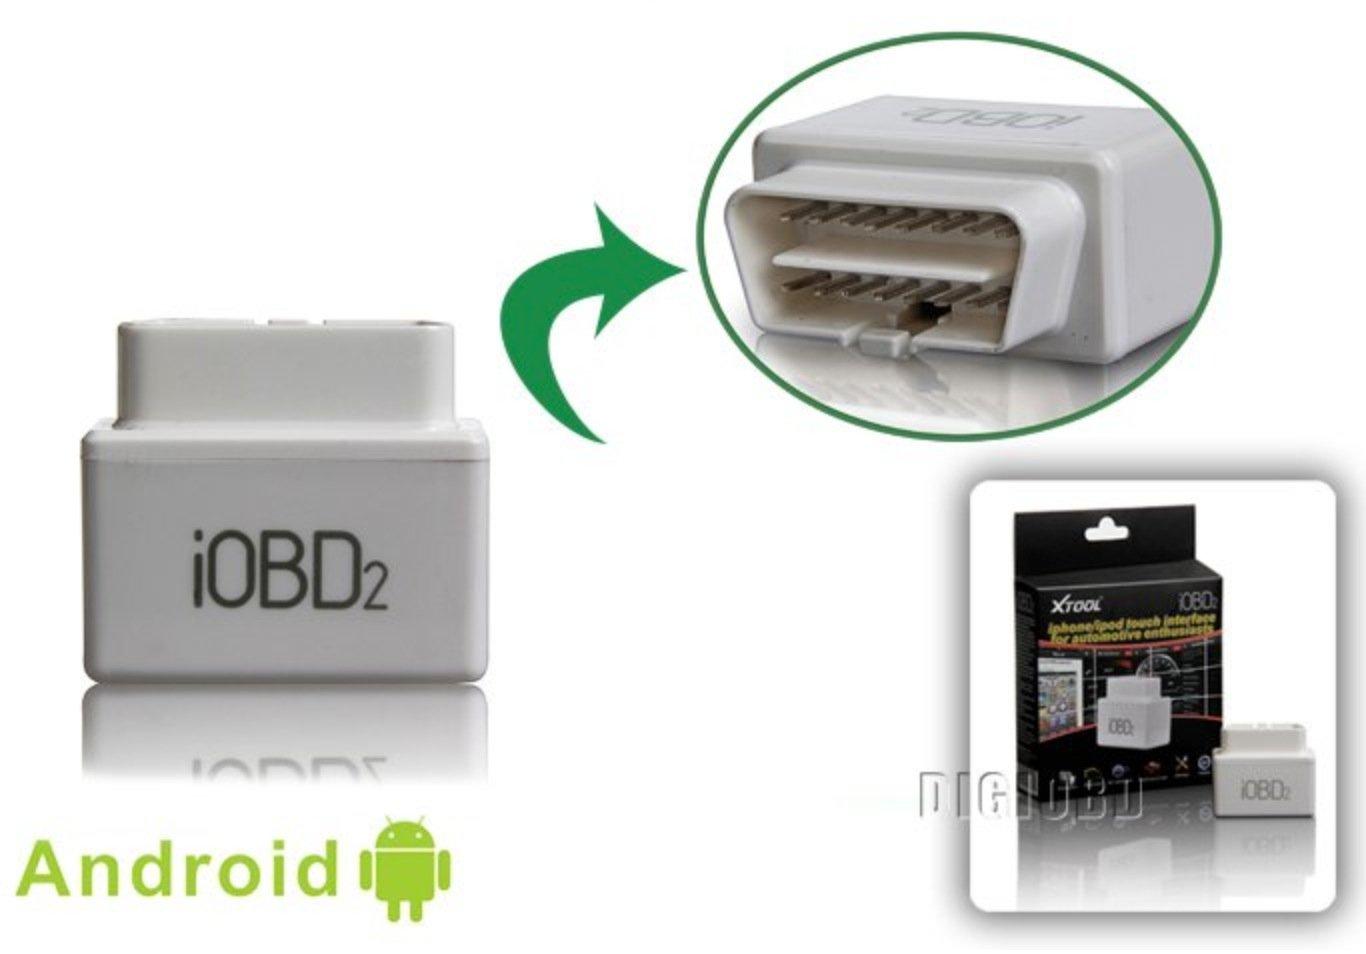 iobd2 Auto-Diagnose-Tool auf dem iPhone durch WIFI.WLAN WIFI OBD2 ...